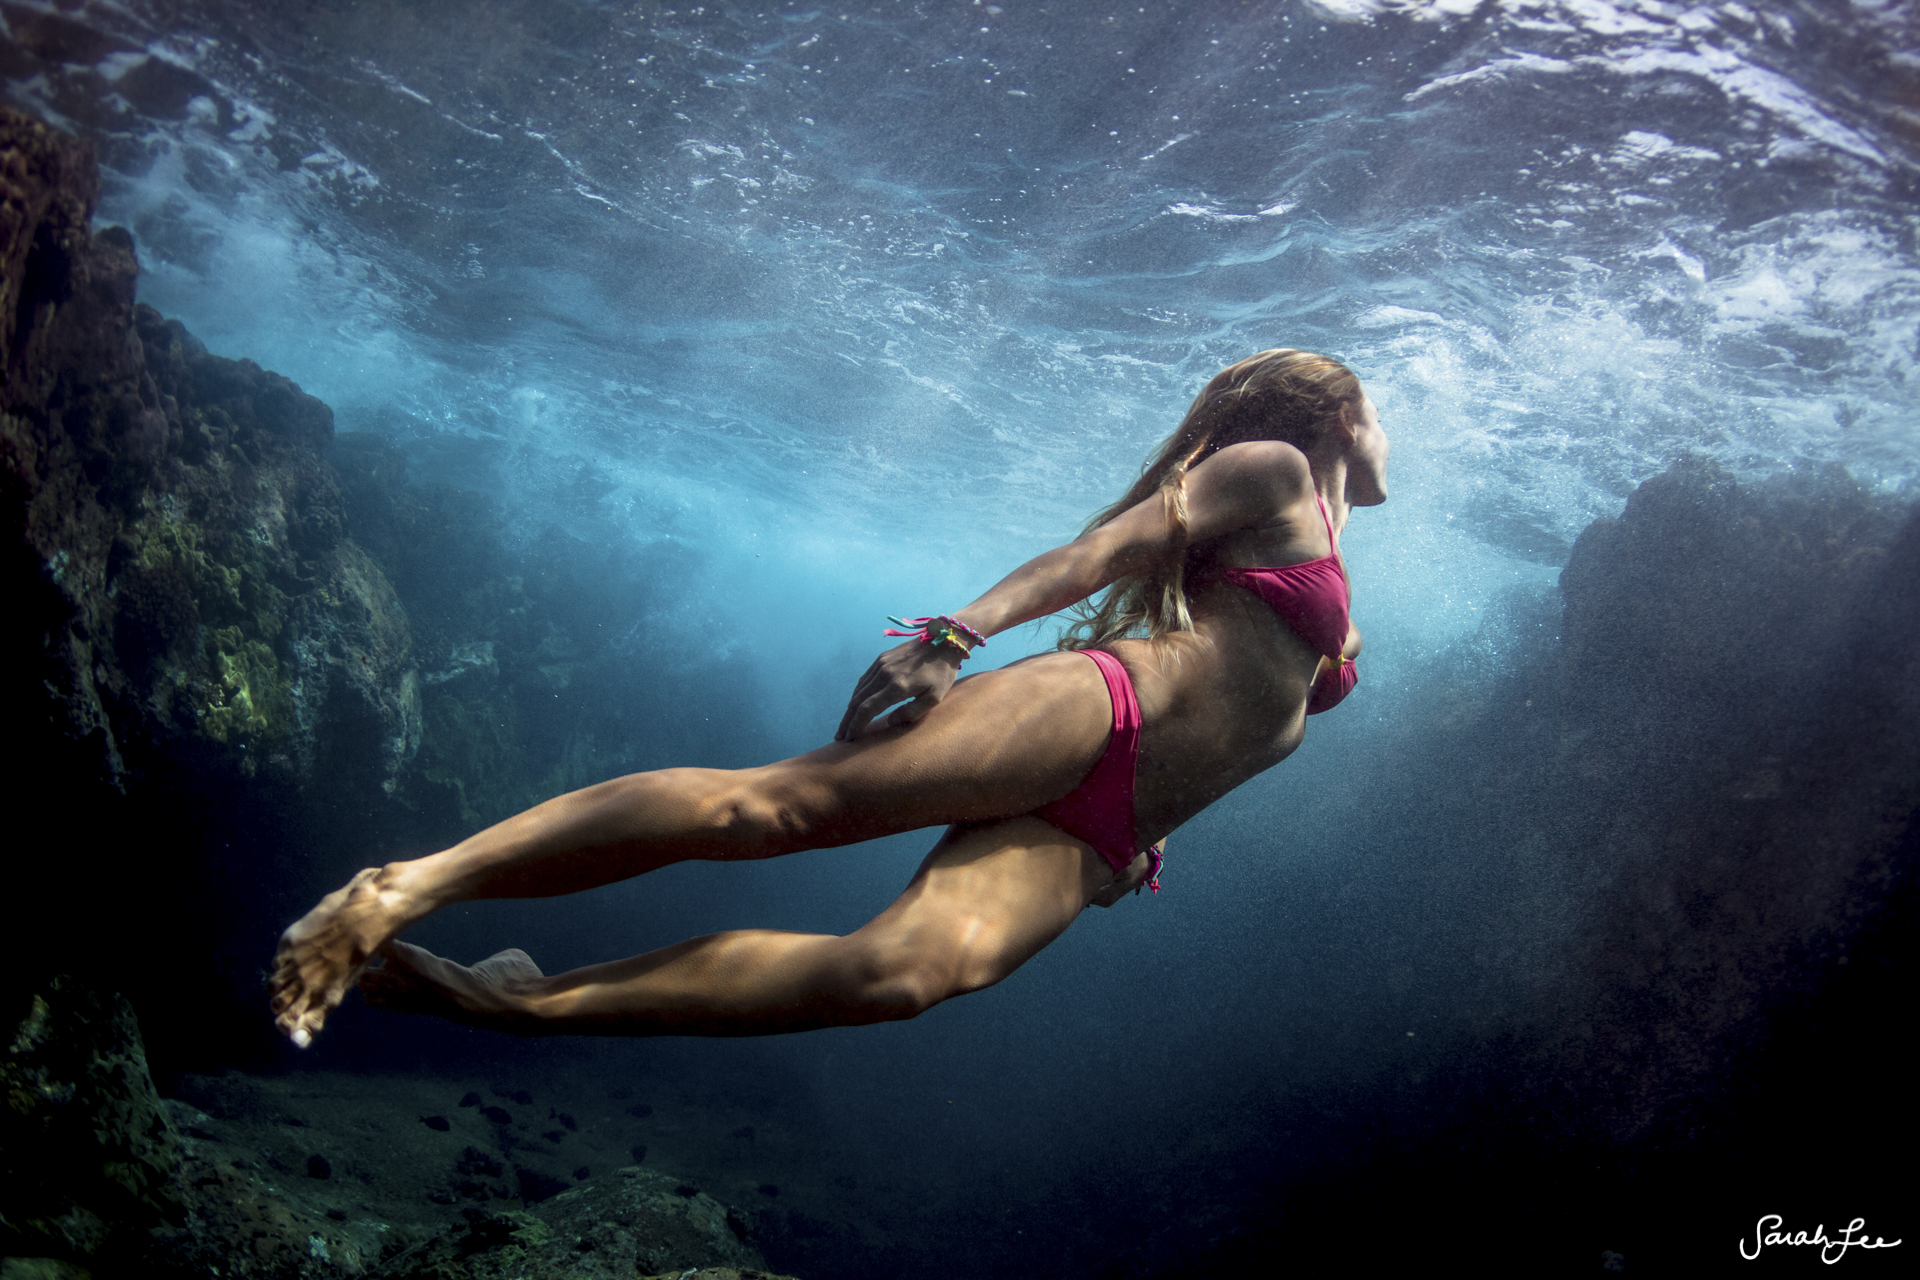 022_Sarah_Lee_Photography_Underwater_9478.jpg